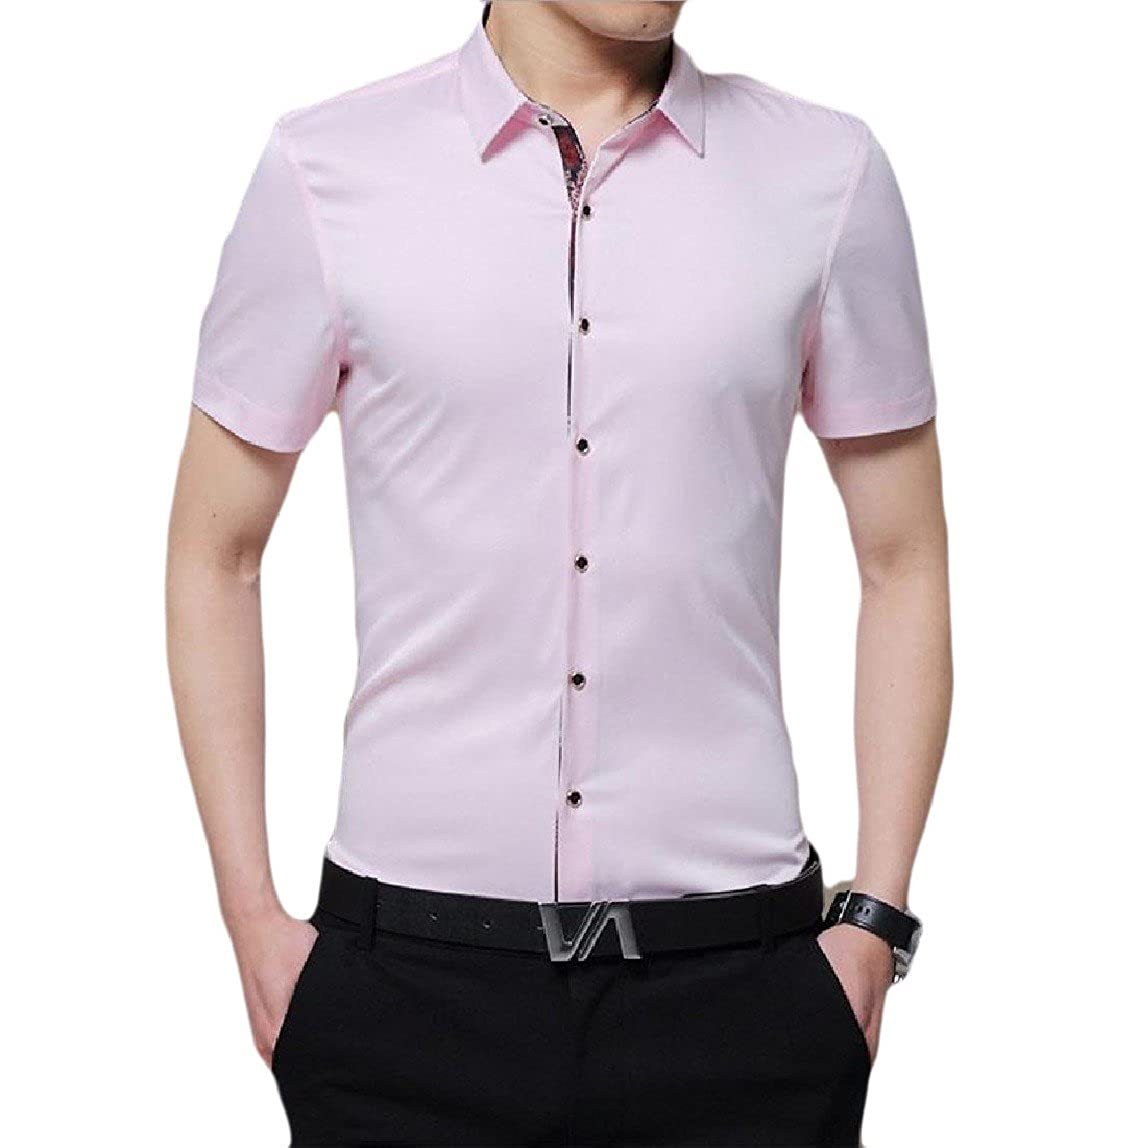 QueenHandsMen QueenHands Mens Pure Color Button-Front Novelty Short Sleeve Dress Shirts Tops